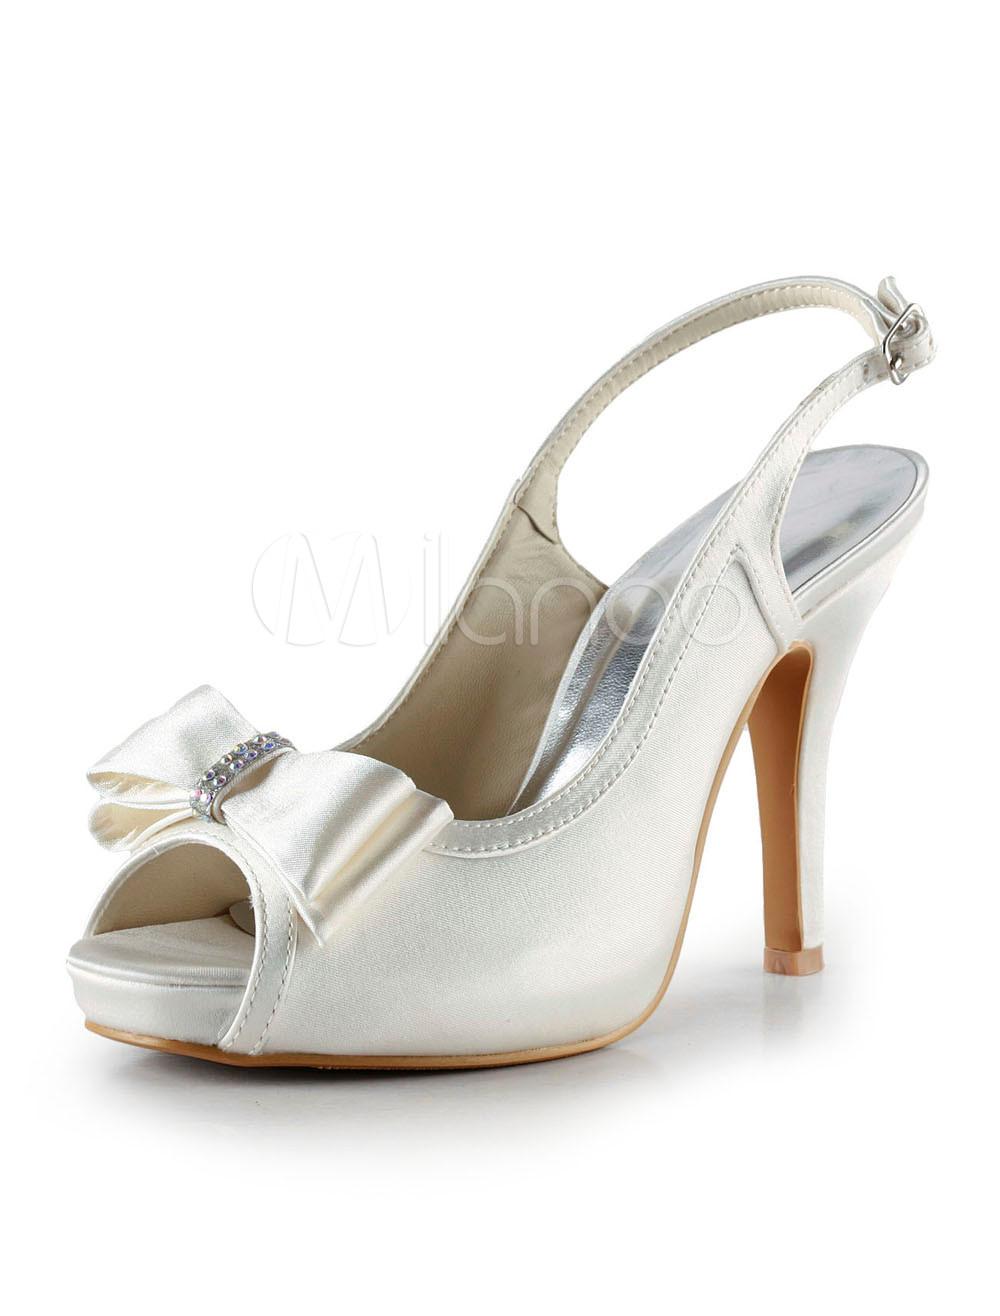 Sweet Ivory Satin Bow Slingback Heels For Bride